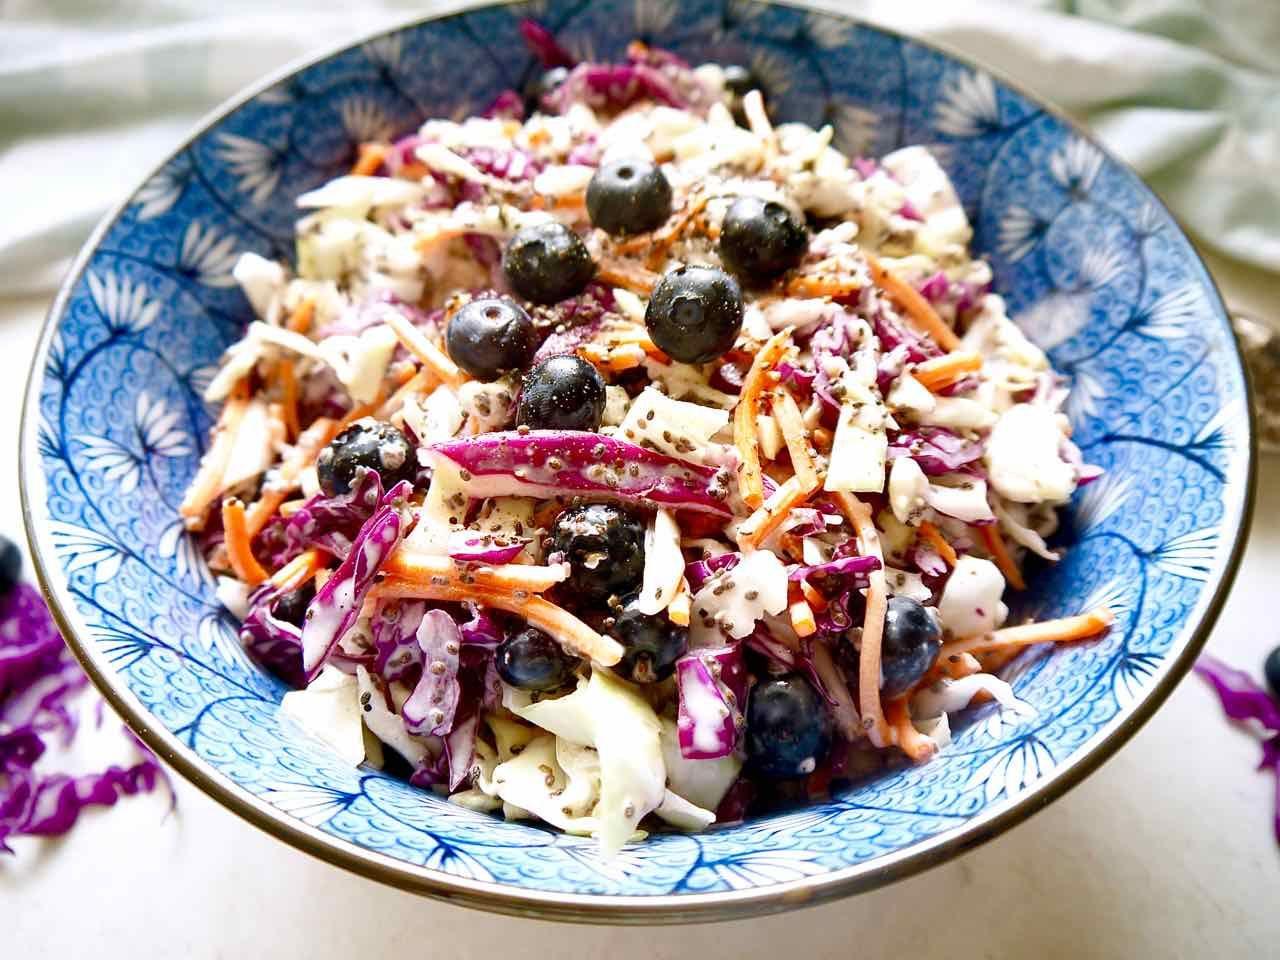 Blueberry Chia Seed Coleslaw (Paleo, GF) Recipe